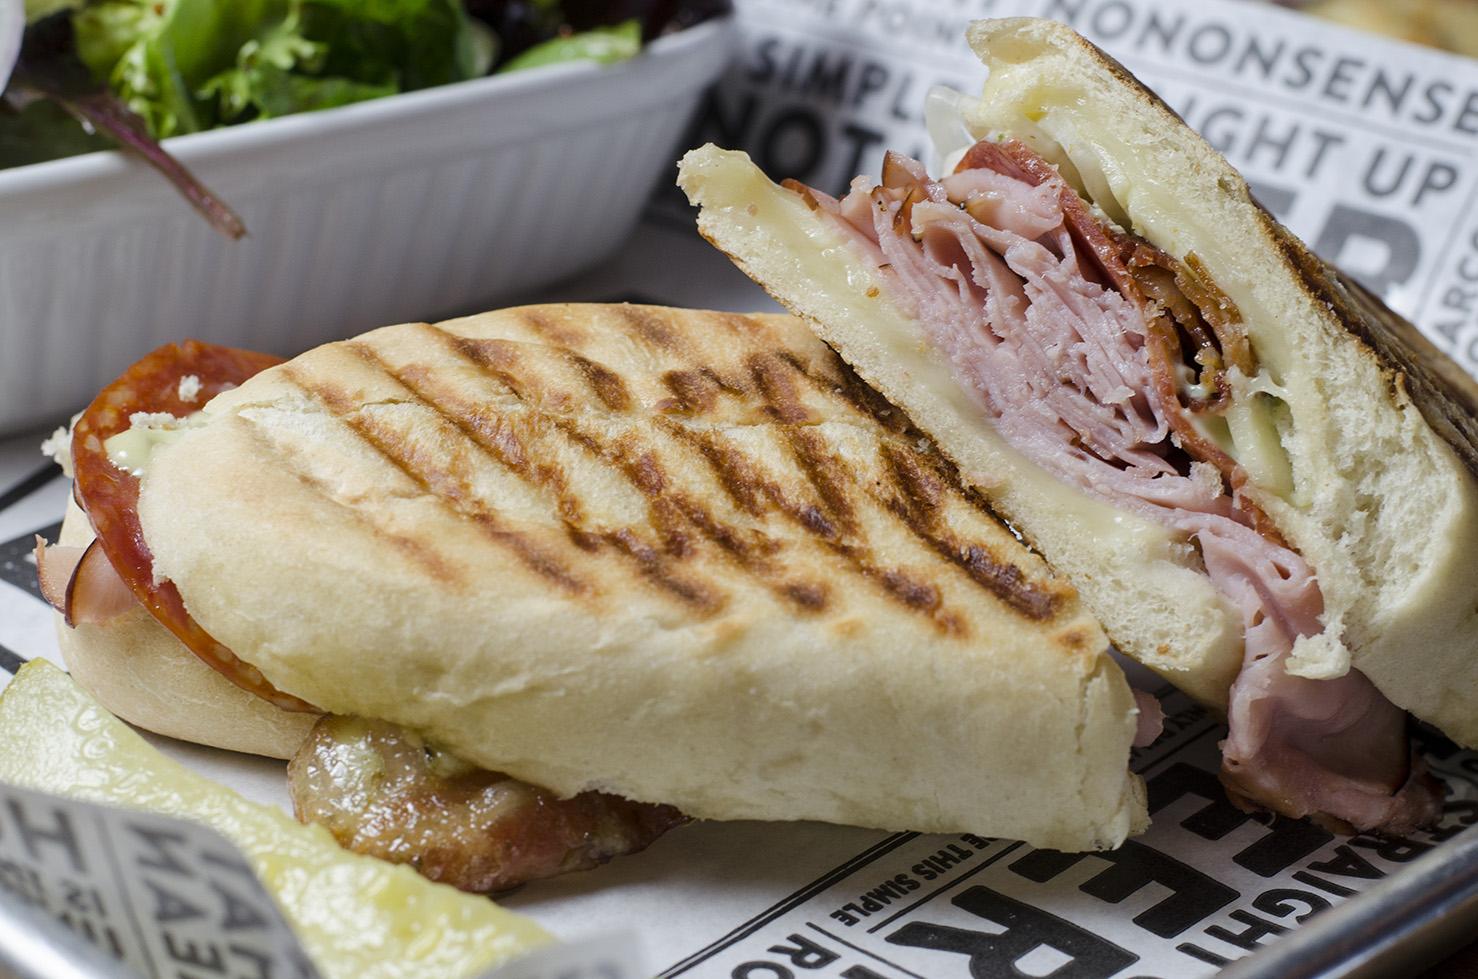 The meaty Italian Man Sandwich at Frank Brewing Co.